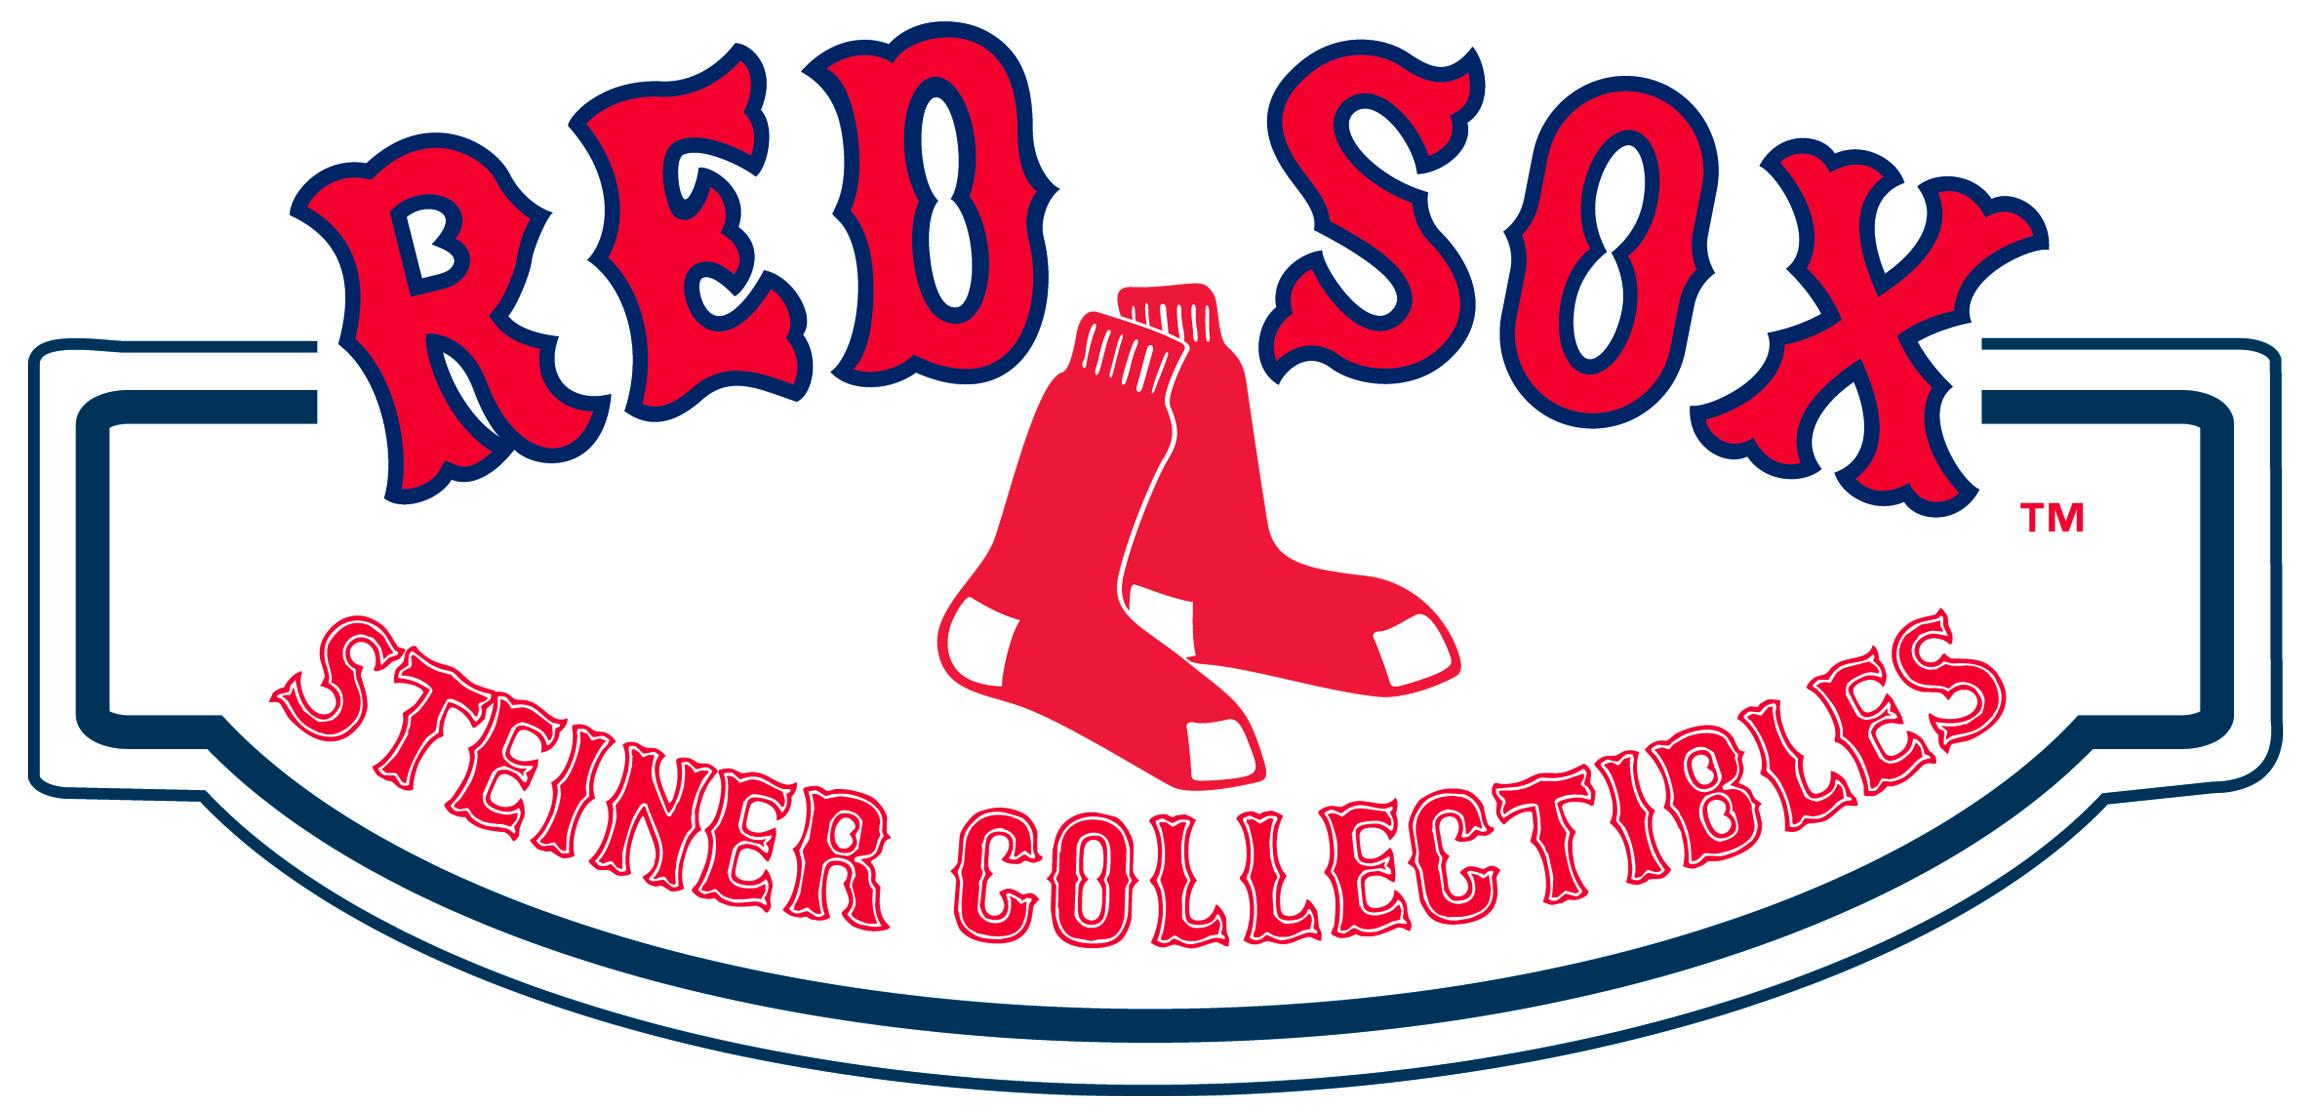 Boston Red Sox Vector at GetDrawings.com.